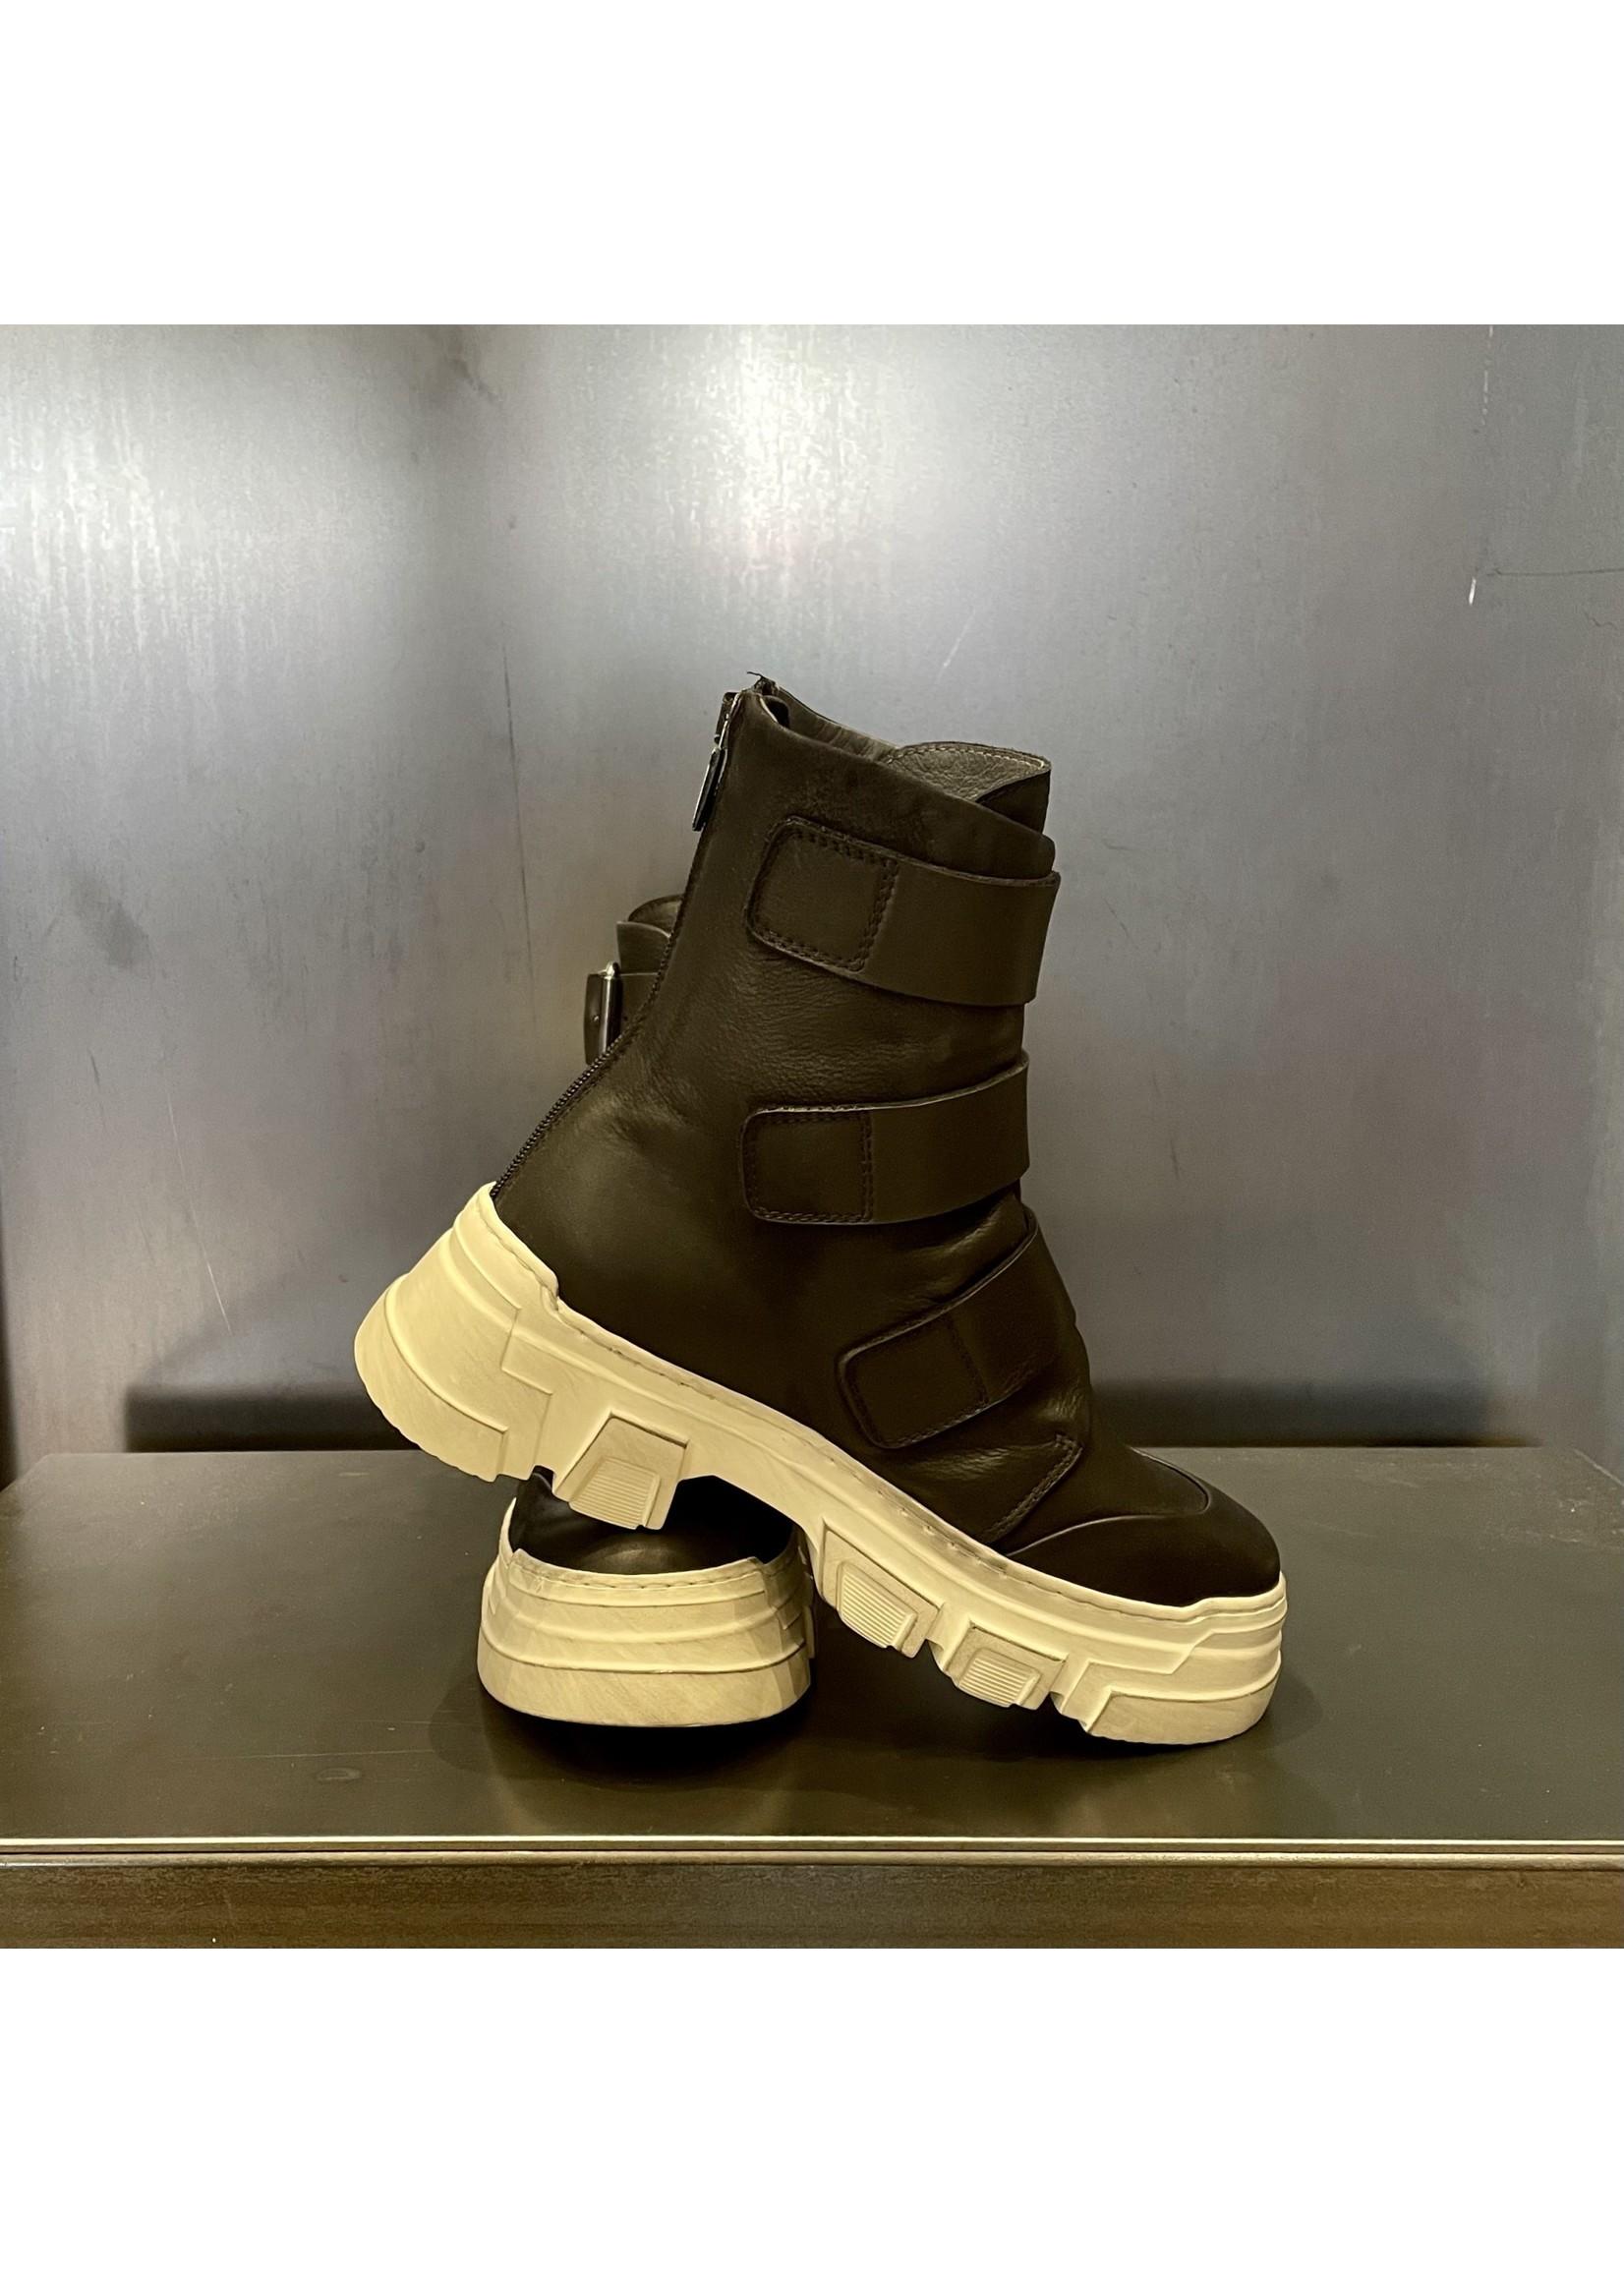 Lofina Lofina 3 Buckle Boot